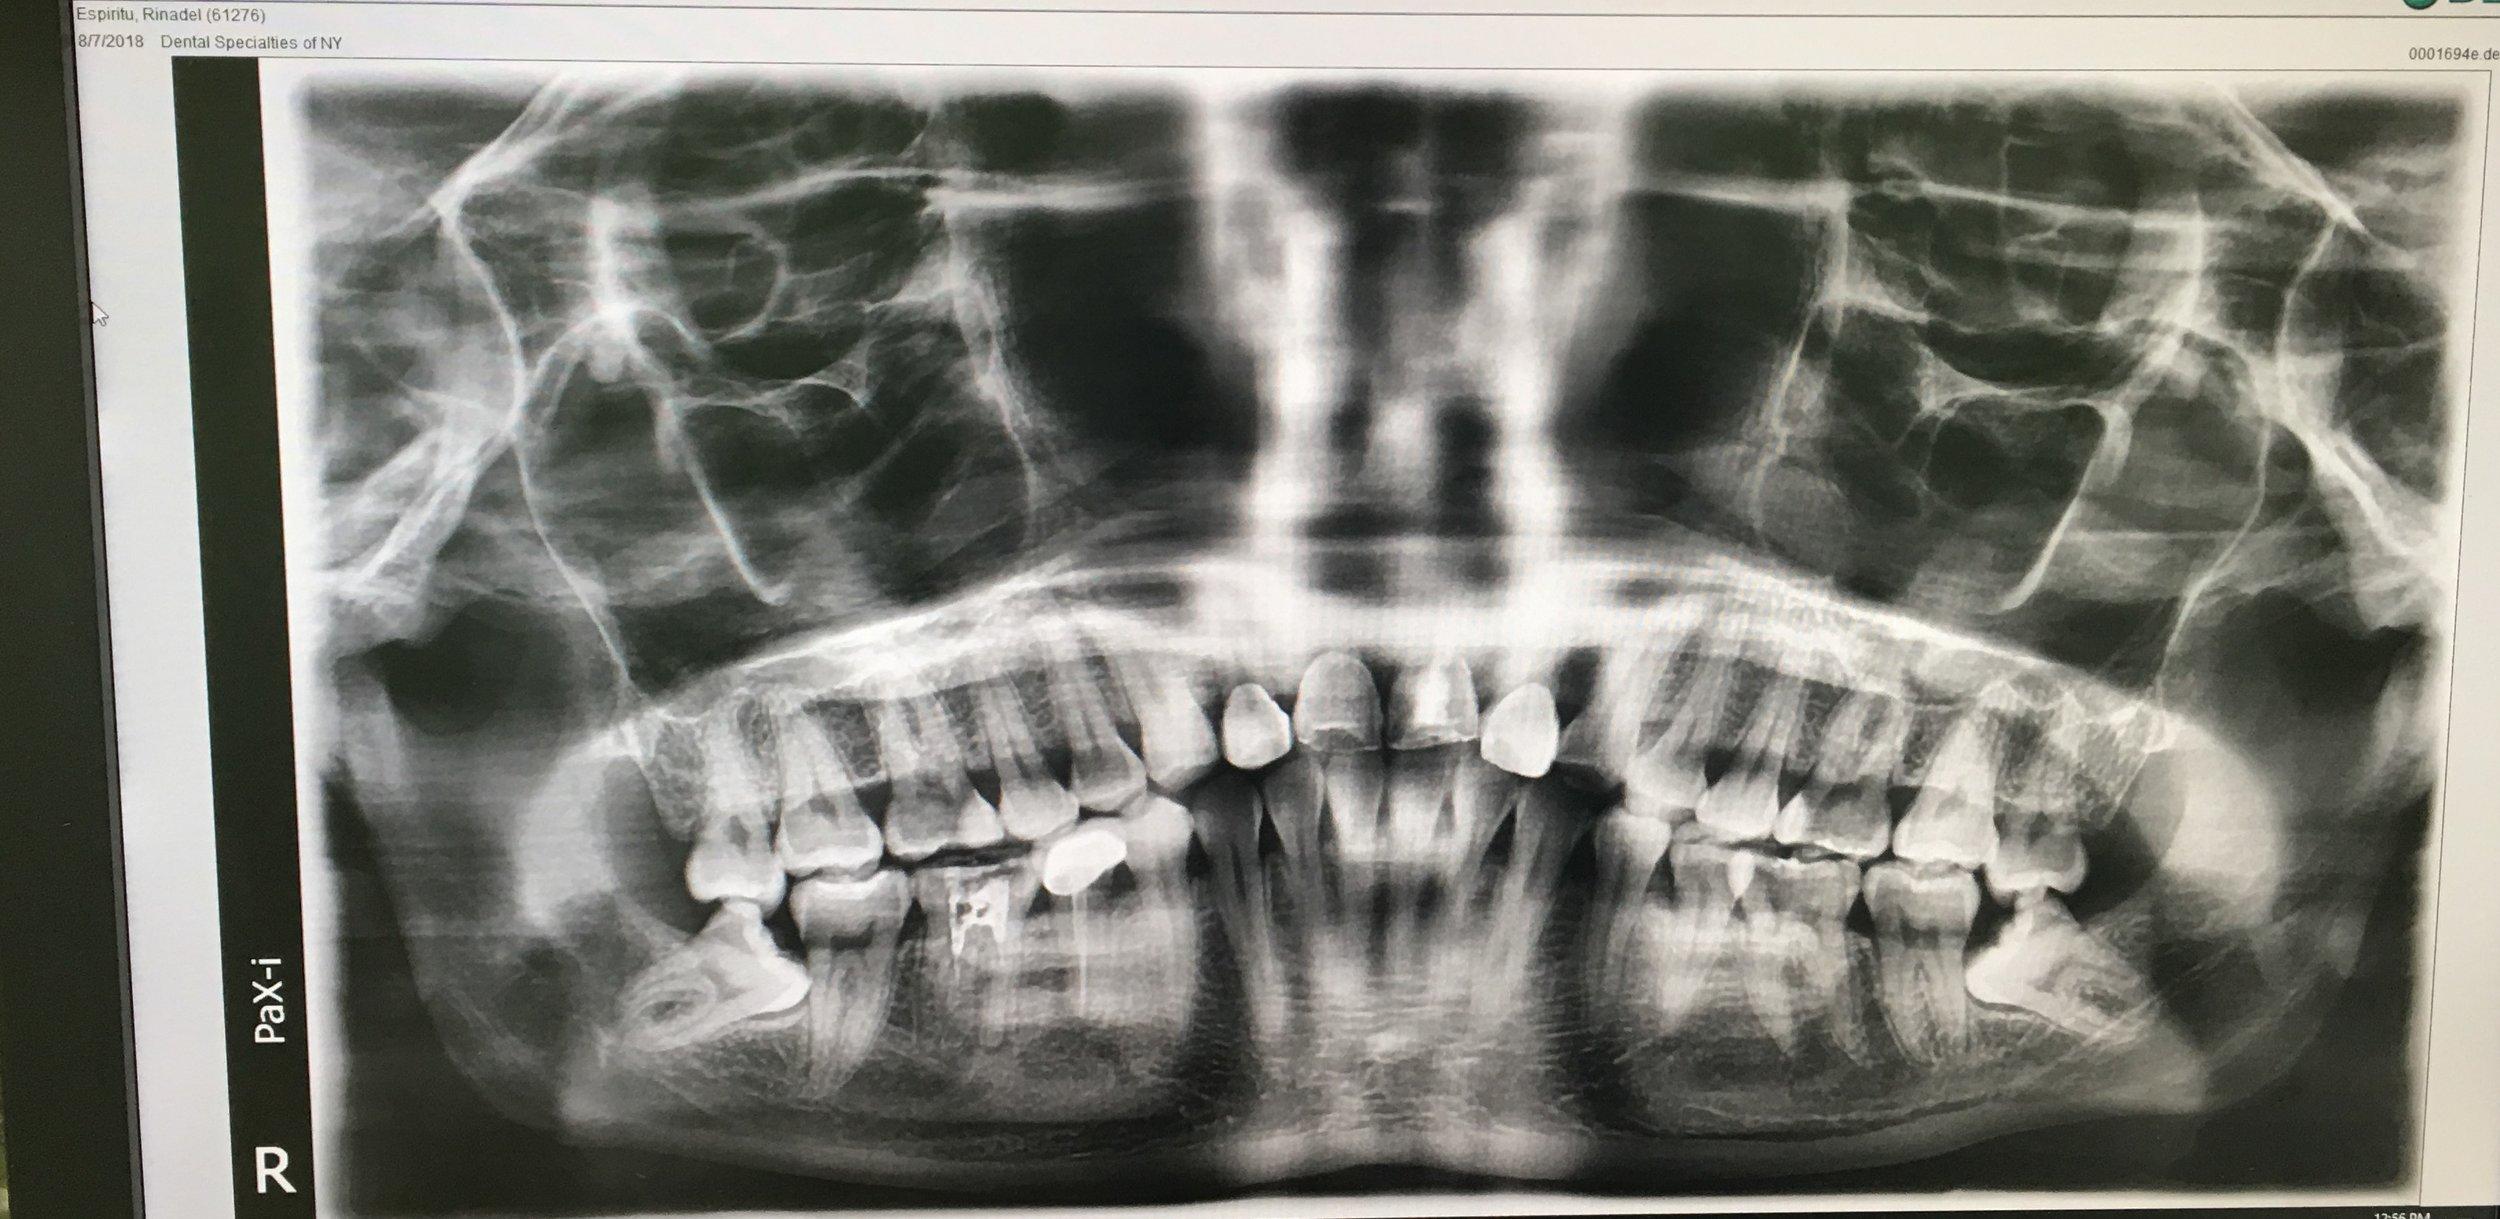 X-ray of my teeth ensemble as of 07/30/2018